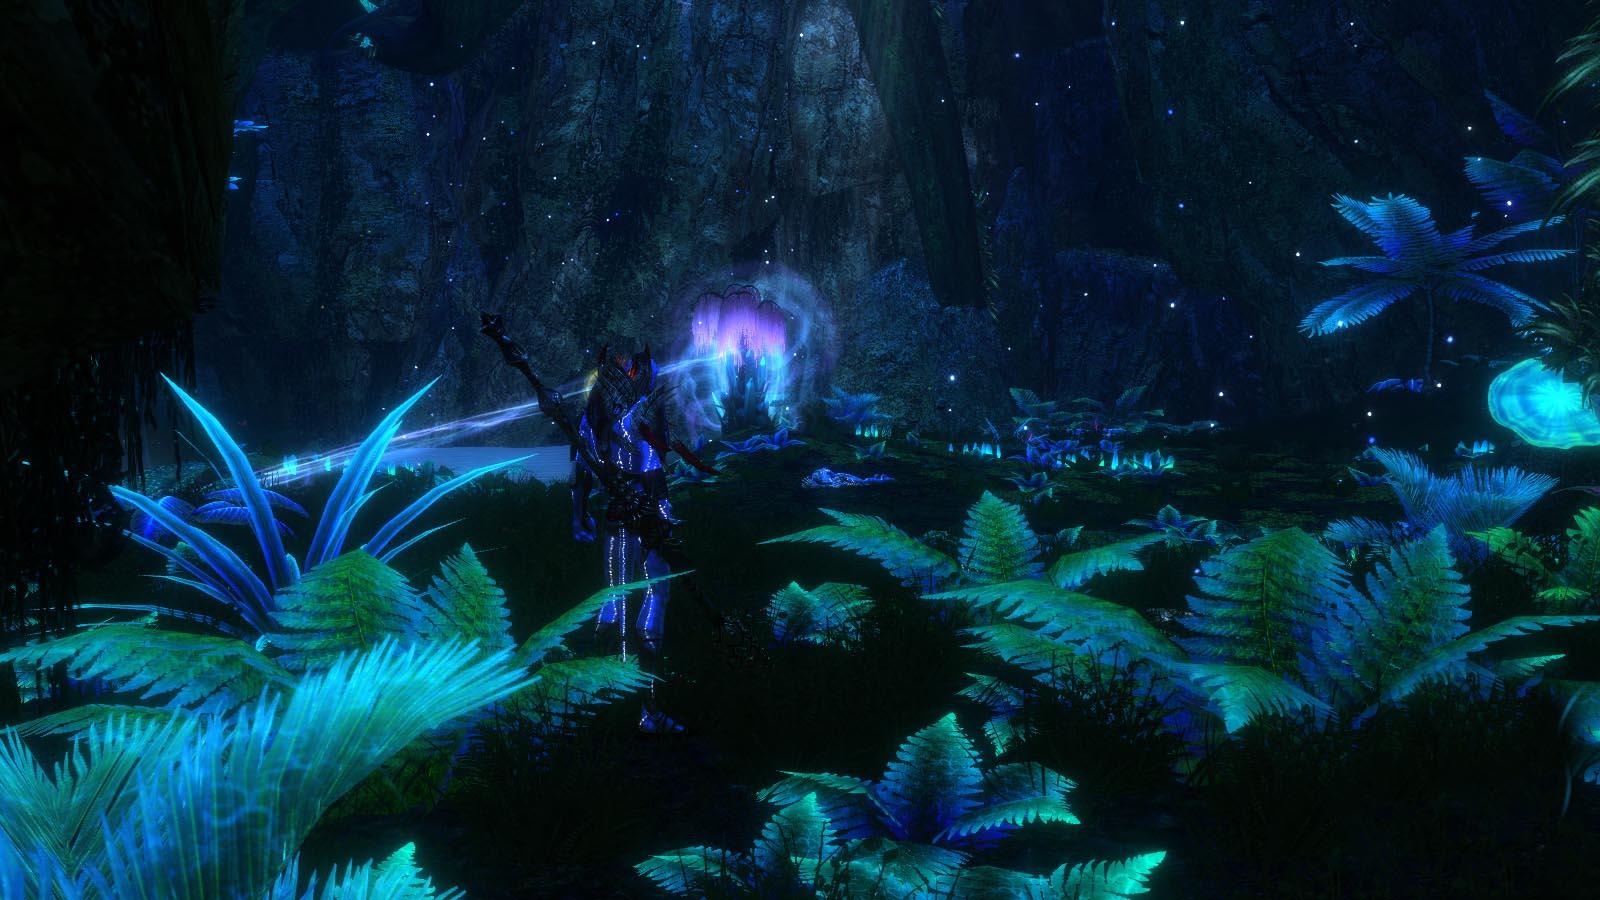 Avatar Tree Wallpaper Cavern of Songs